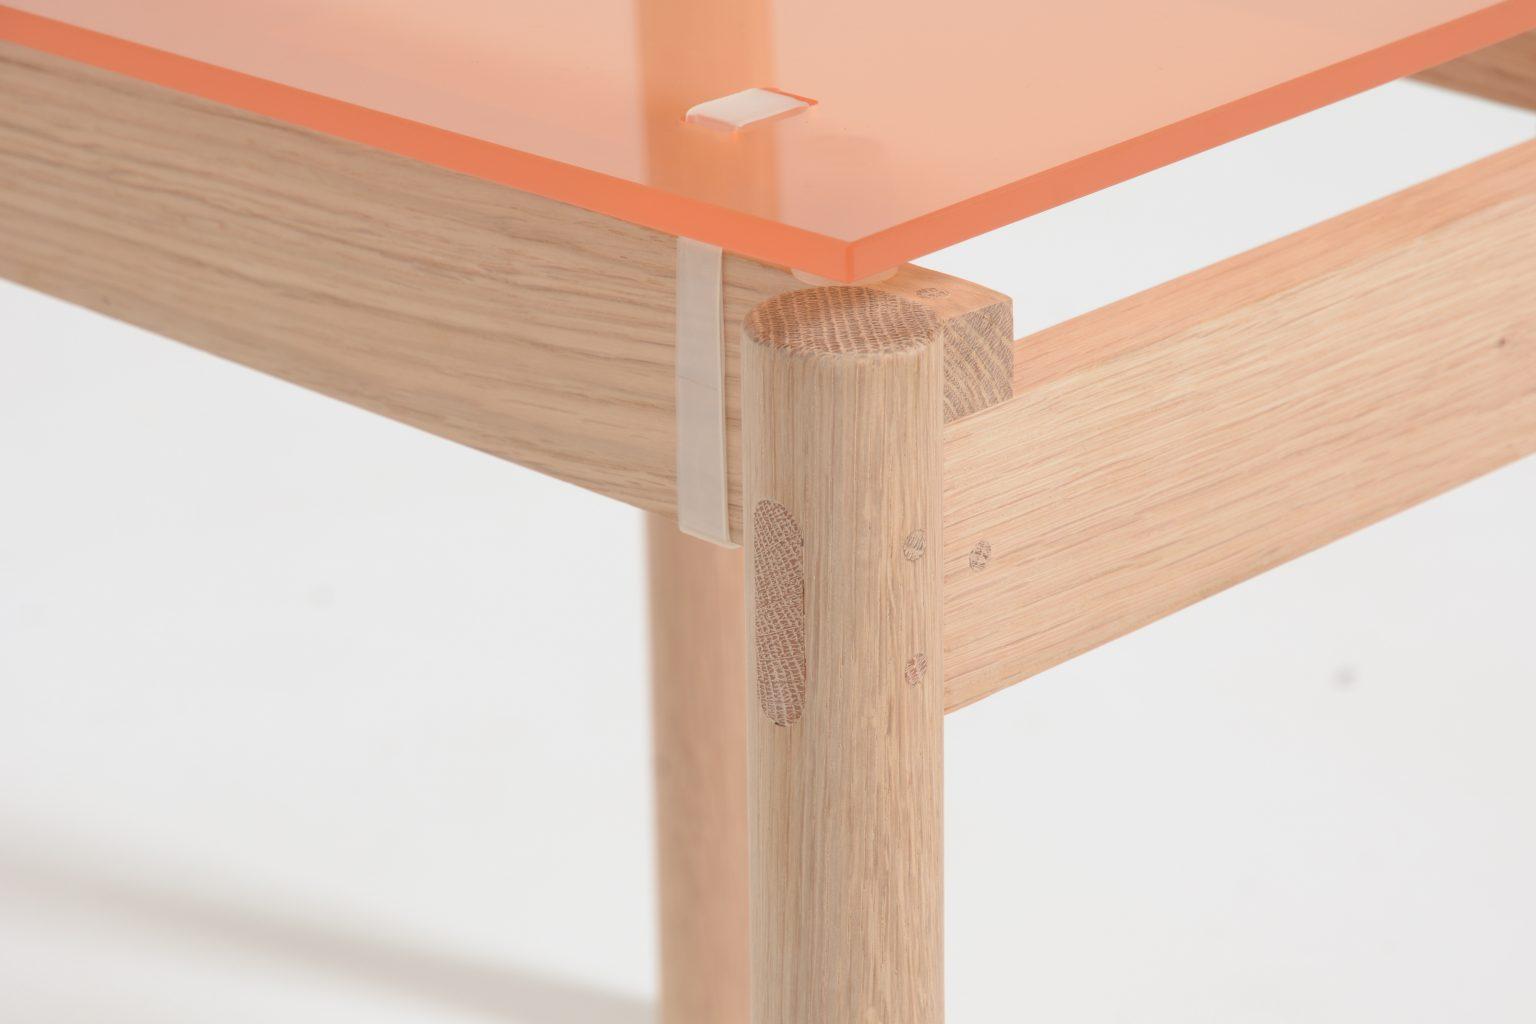 Biennale Interieur - Belgium's leading design and interior event - Final-chair-2.jpg